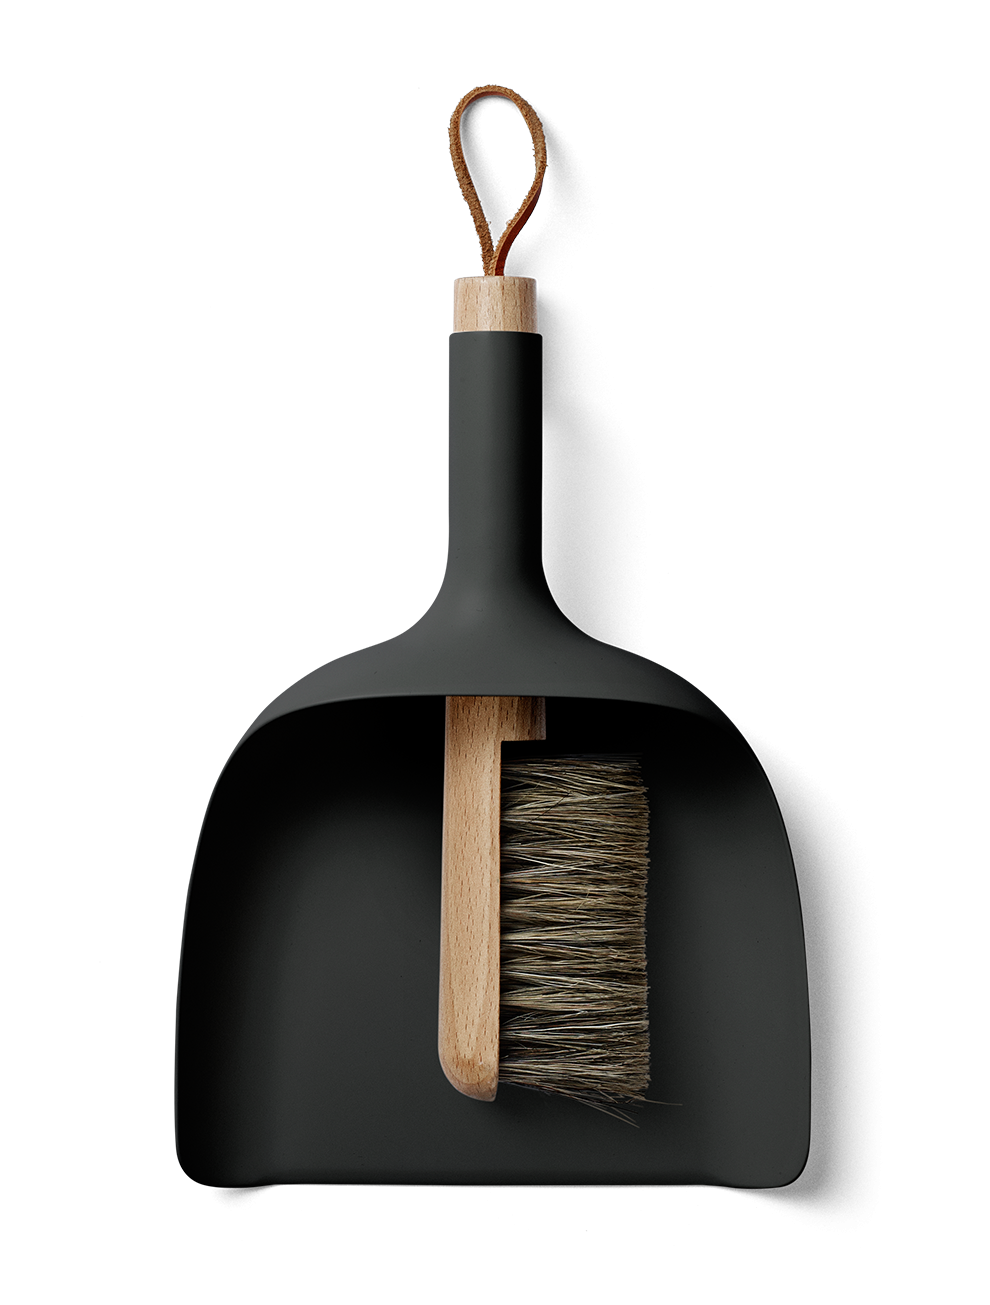 Sweeper - MENU A/S / design by Jan Kochanski